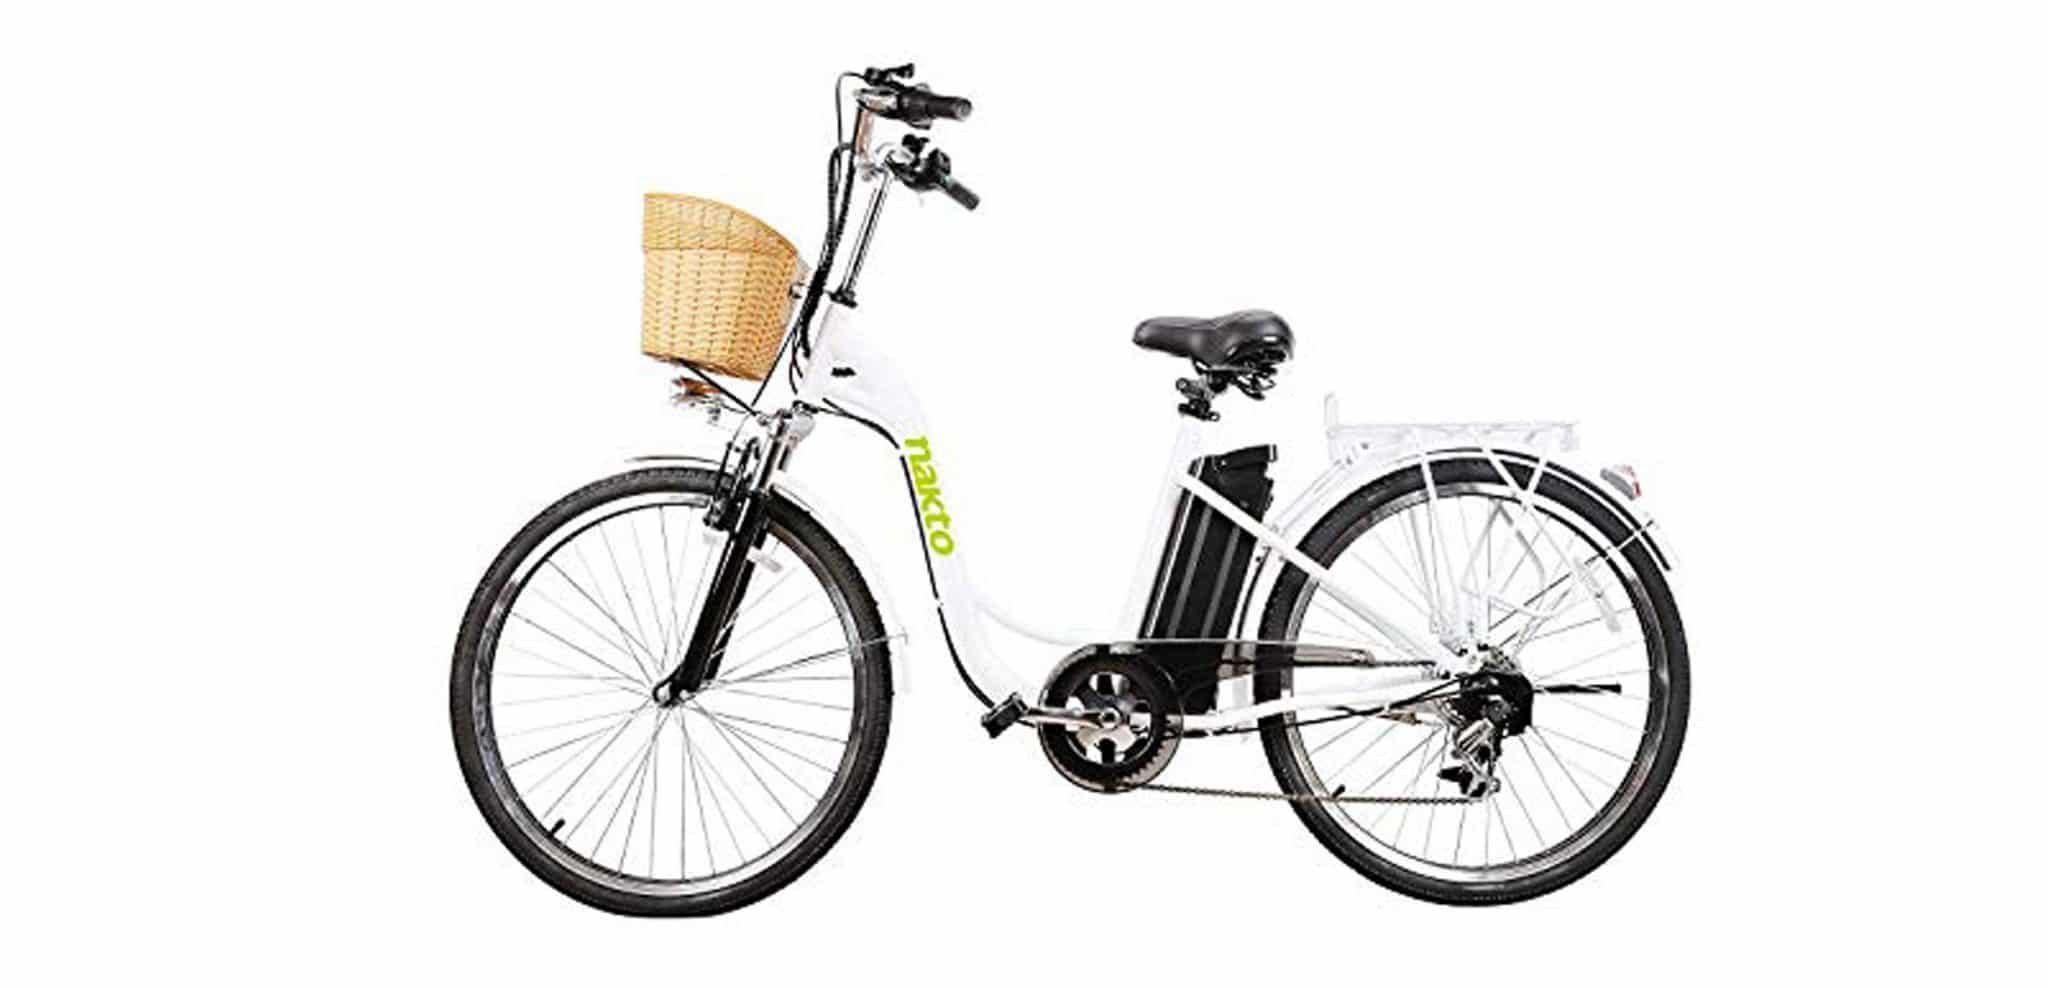 Nakto Electric Cruiser Bike Review – Cheapest Ebike on the Market